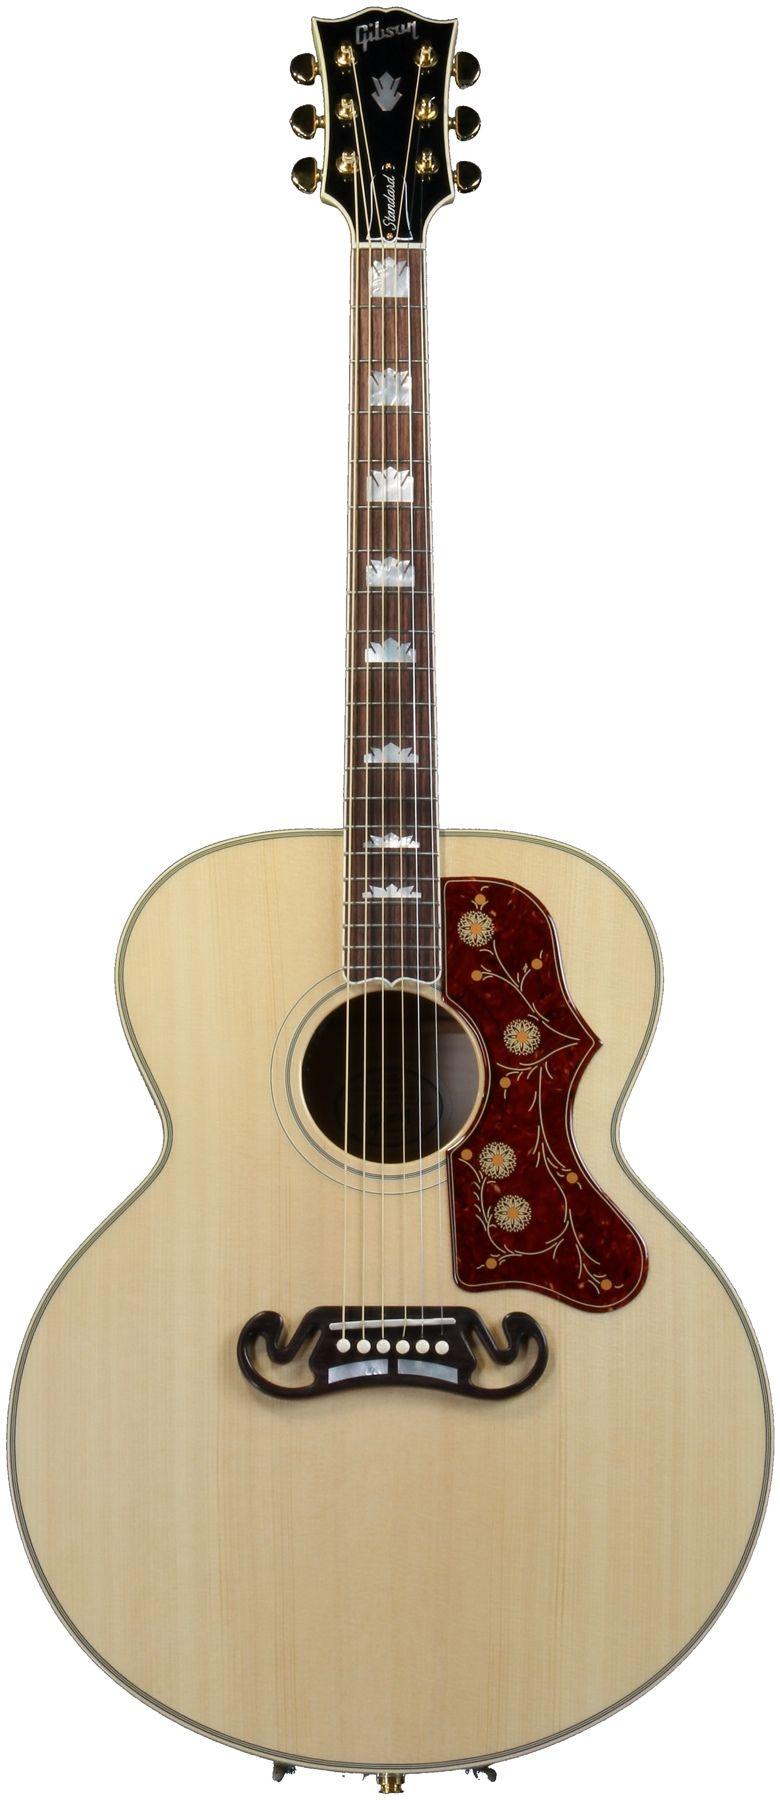 gibson acoustic sj 200 standard antique natural instruments i want guitar acoustic. Black Bedroom Furniture Sets. Home Design Ideas